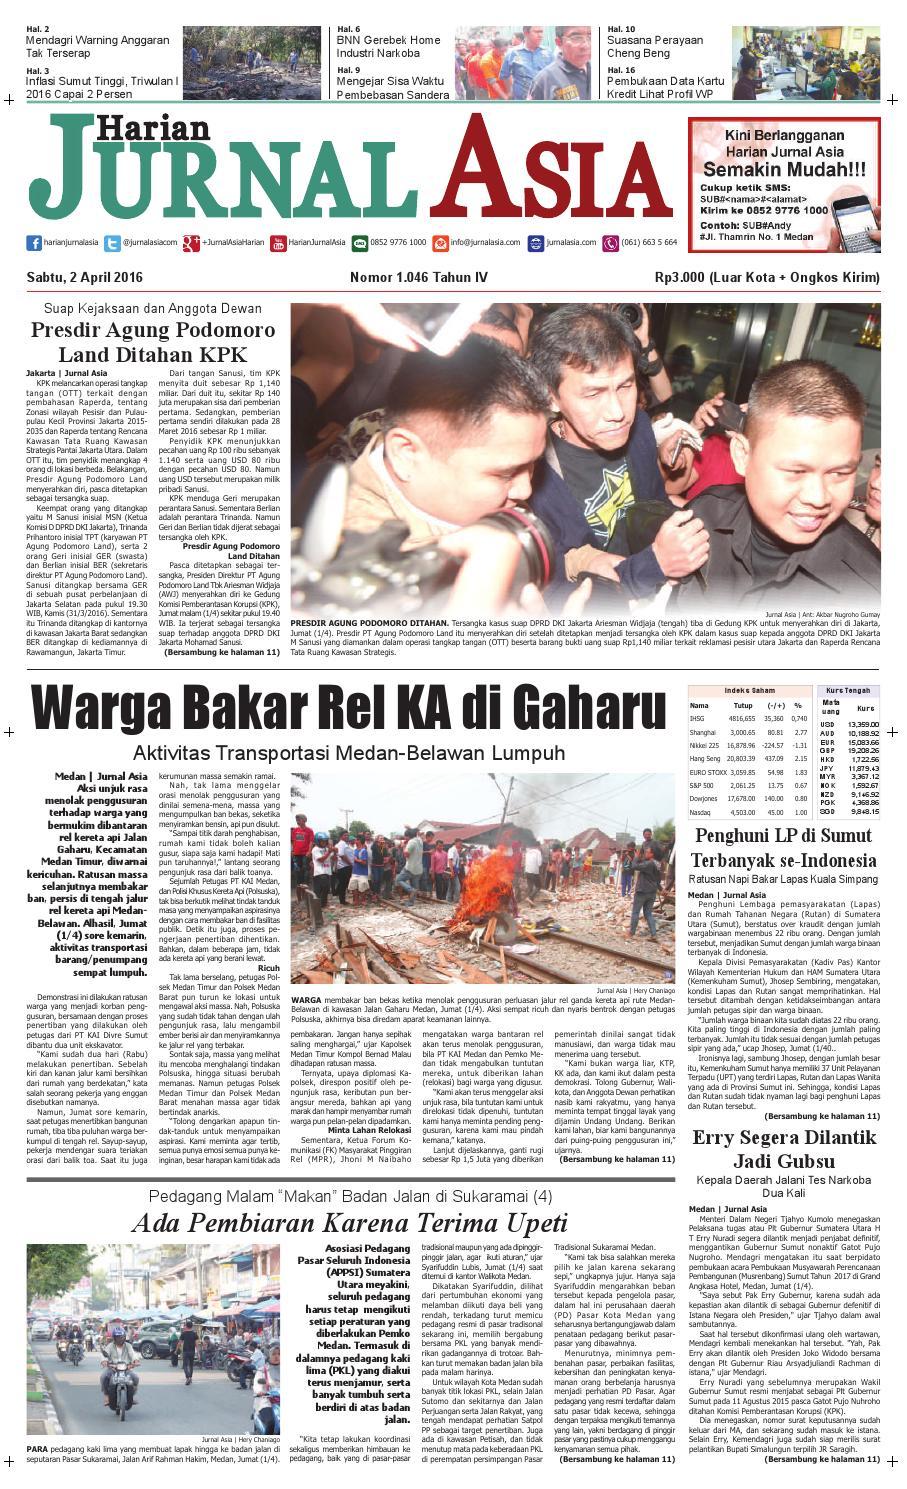 Harian Jurnal Asia Edisi Sabtu 02 April 2016 By Kopibubuk Robusta Toko Rezeki Akumandiri Malang Medan Issuu